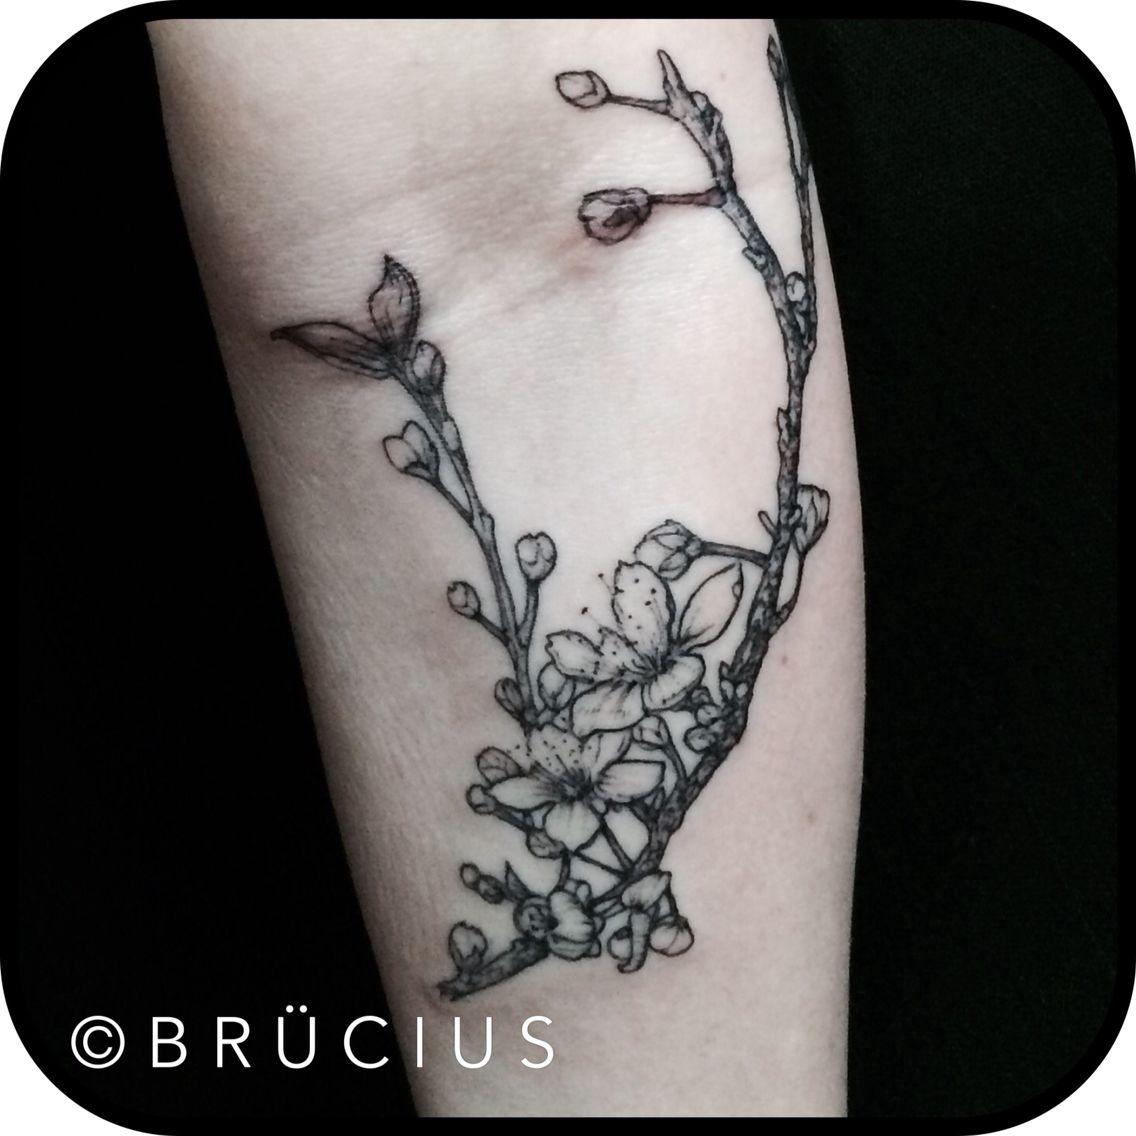 #BRÜCIUS #TATTOO #SF #SanFrancisco #brucius #natural #science #engraving #etching #sculptoroflines #dotwork #blackwork #penandink #lines #cherry #blossoms #branch #dragonfly